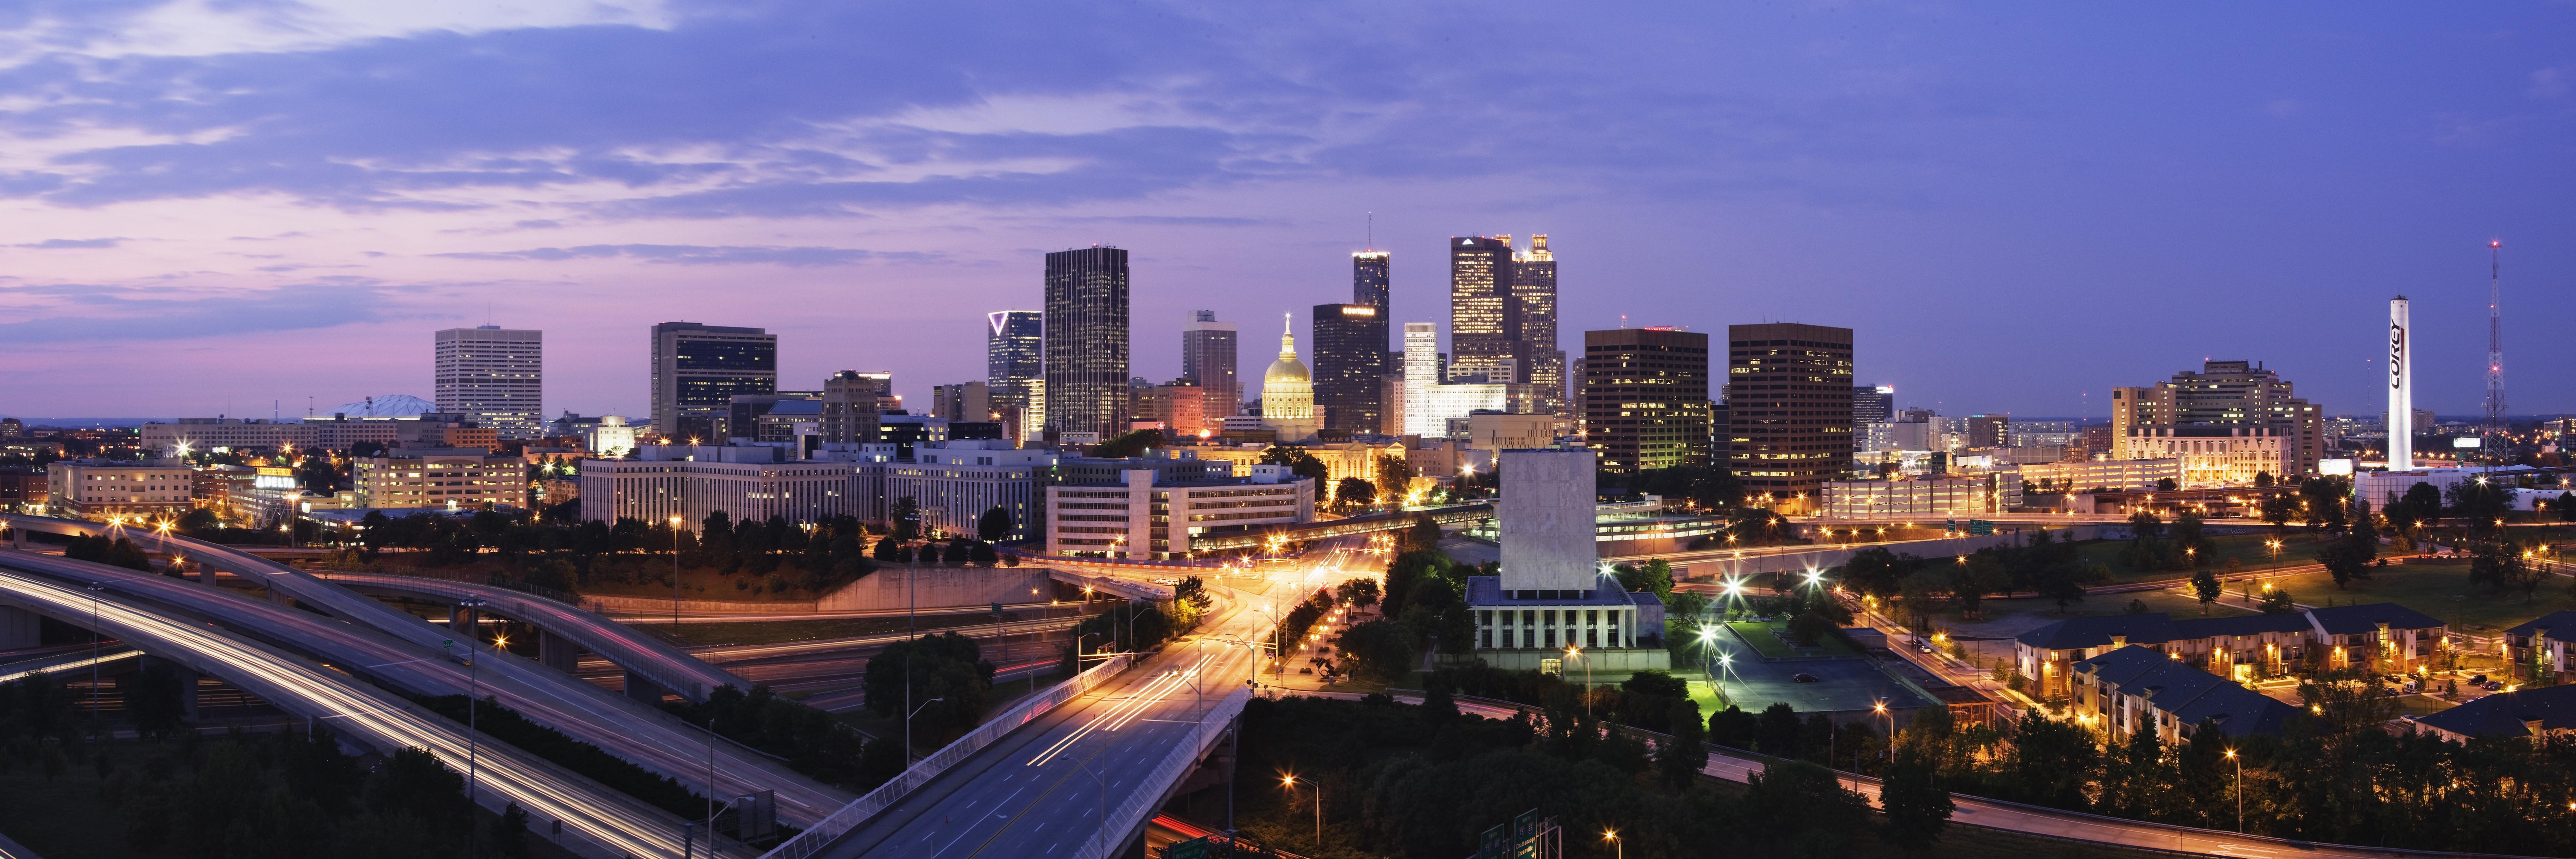 Buildings in a city, Downtown Atlanta, Atlanta, Georgia, USA